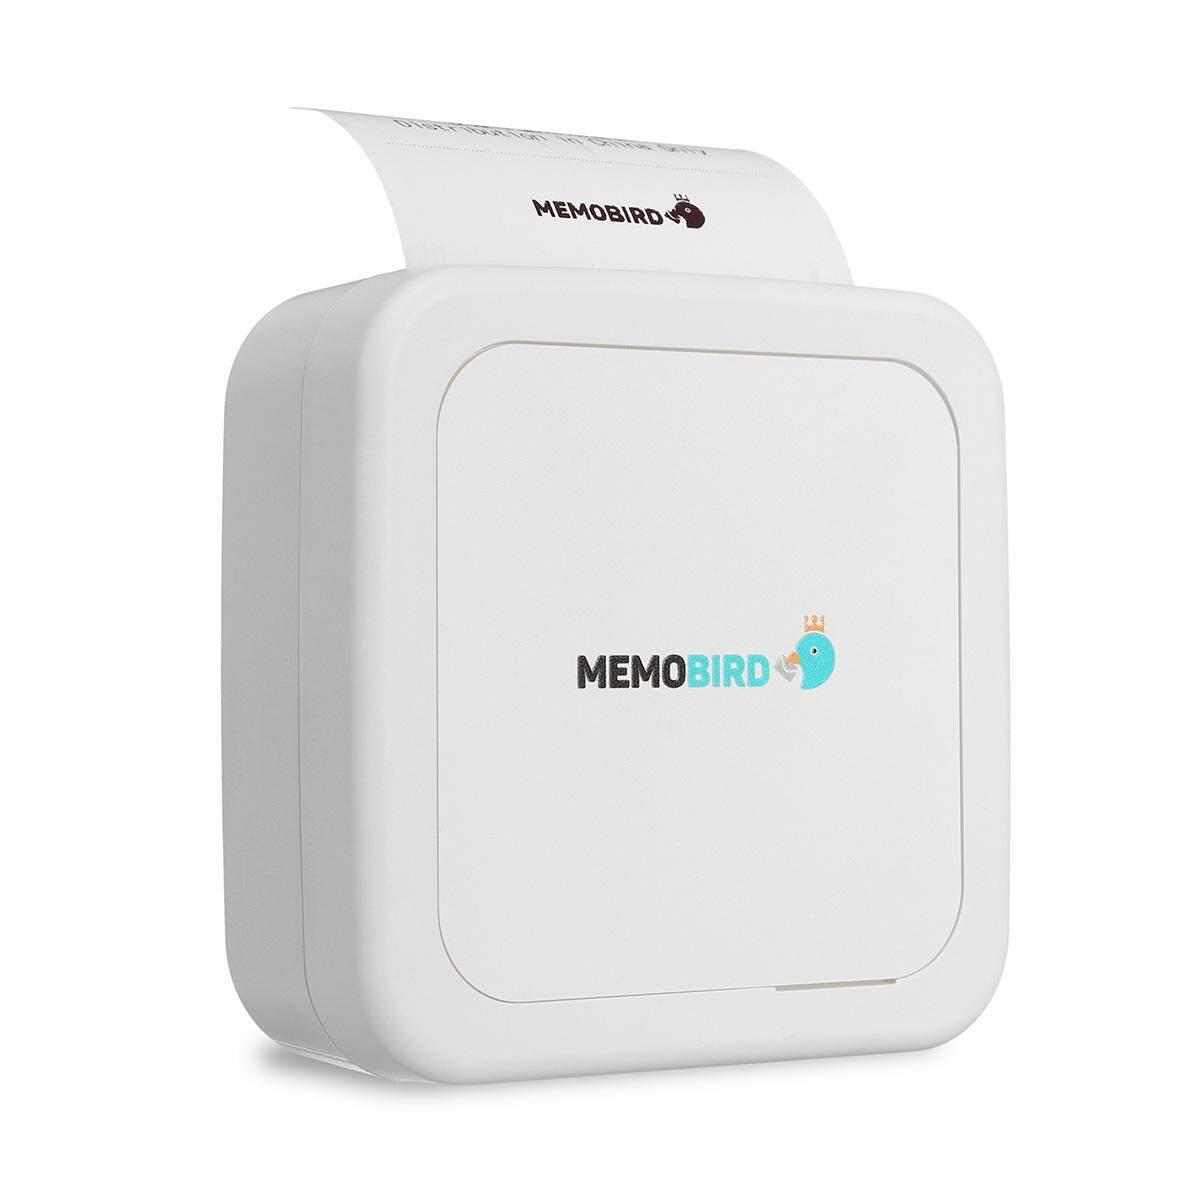 Hình ảnh Portable Memobird G3· Printer Bluetooth Wireless Pocket Thermal Wifi Printer - intl